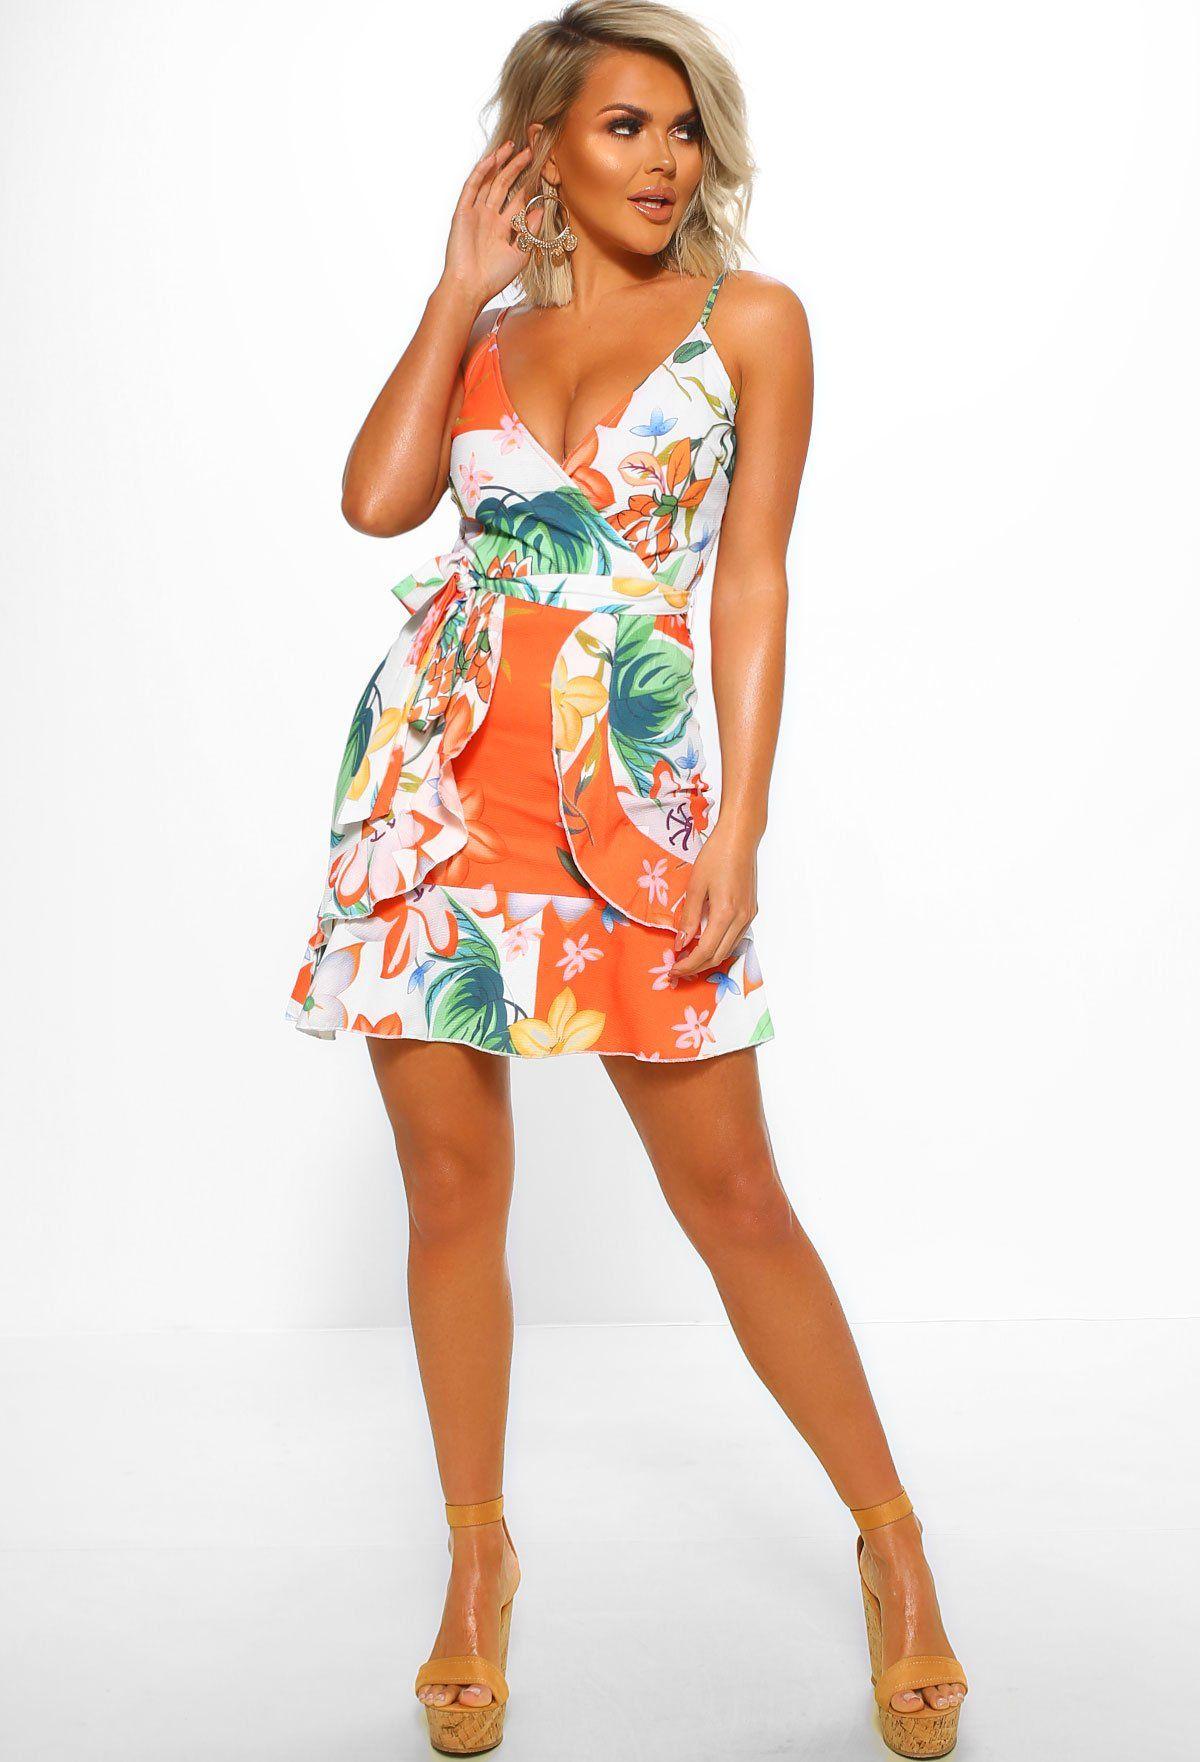 Sunny In California Orange Floral Frill Wrap Mini Dress Orange Mini Dress Dresses Mini Dress